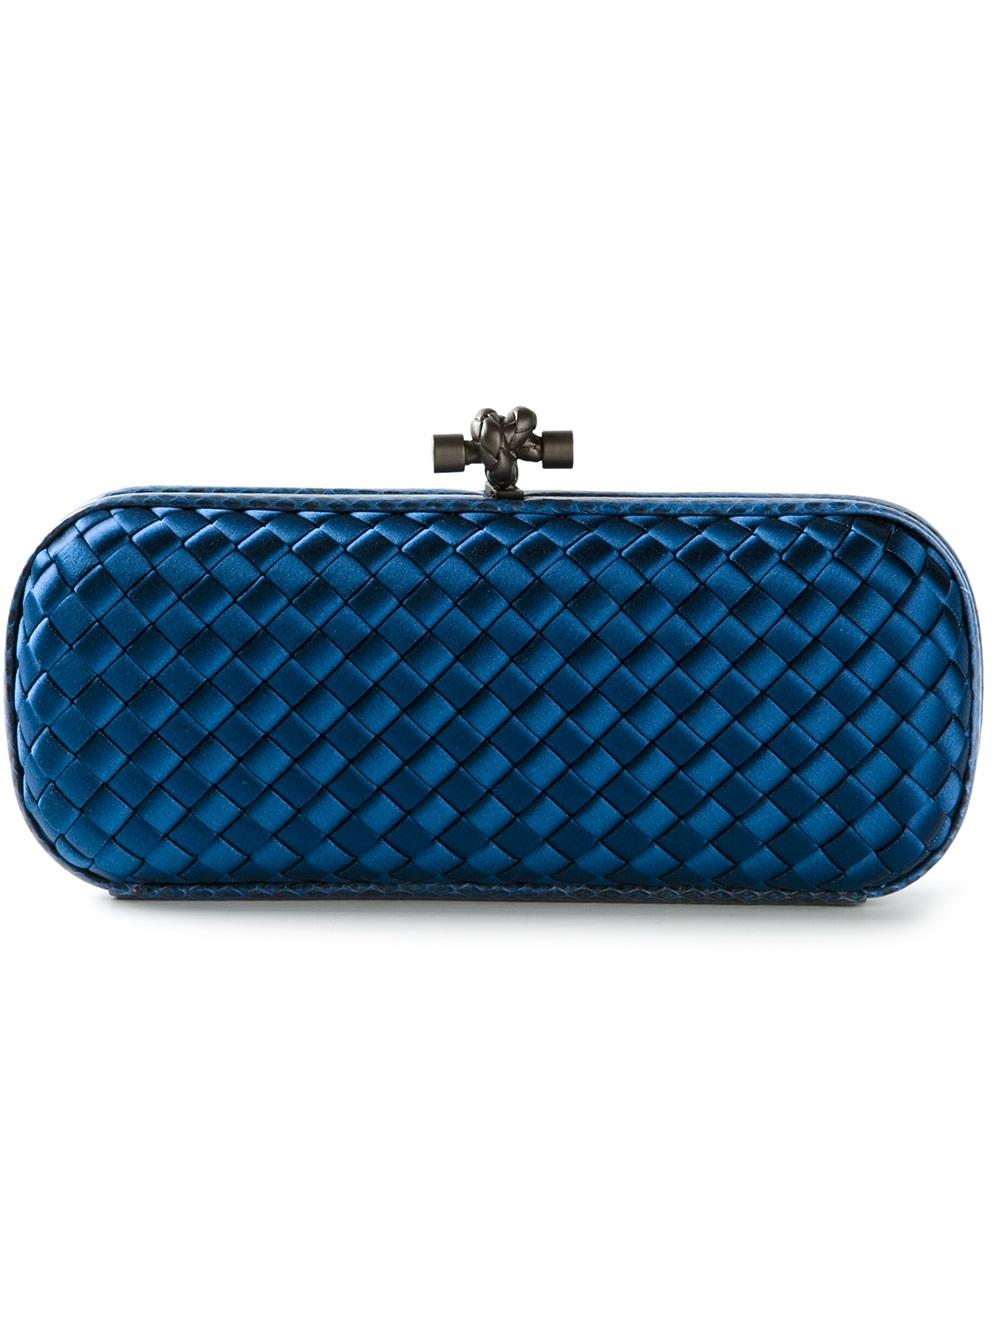 bottega veneta intrecciato clutch in blue lyst. Black Bedroom Furniture Sets. Home Design Ideas